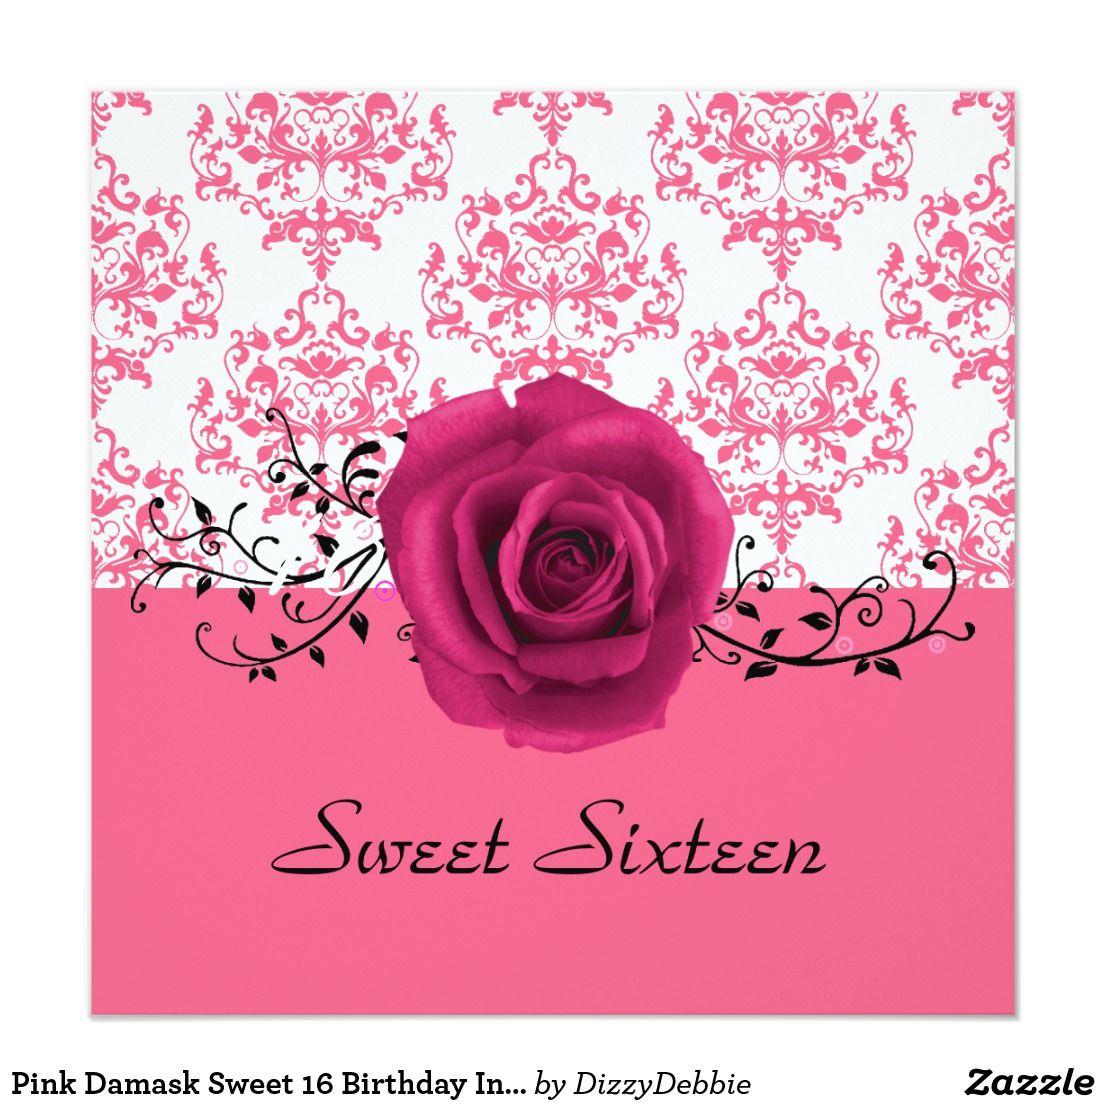 Pink Damask Sweet 16 Birthday Invitation